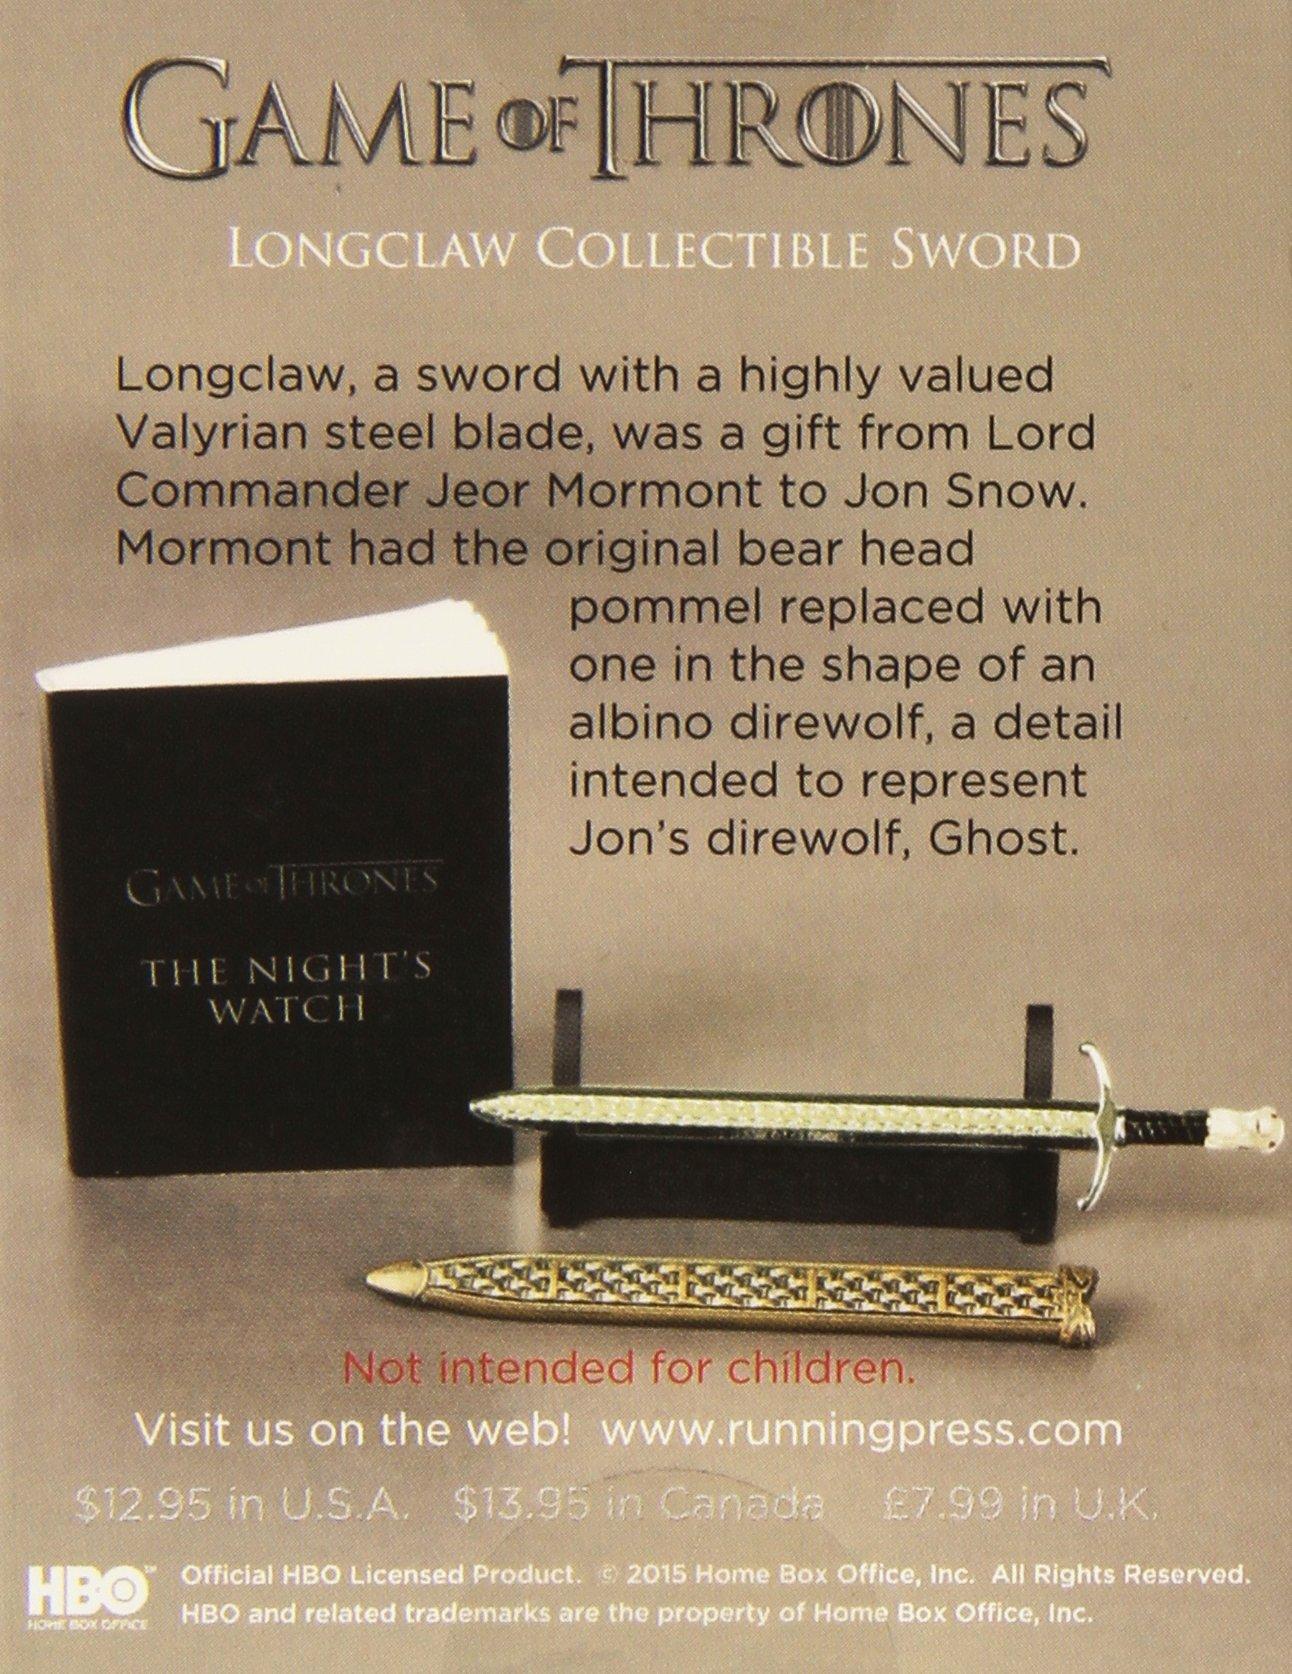 Amazon.com: Longclaw - Espada coleccionable, juego de tronos ...